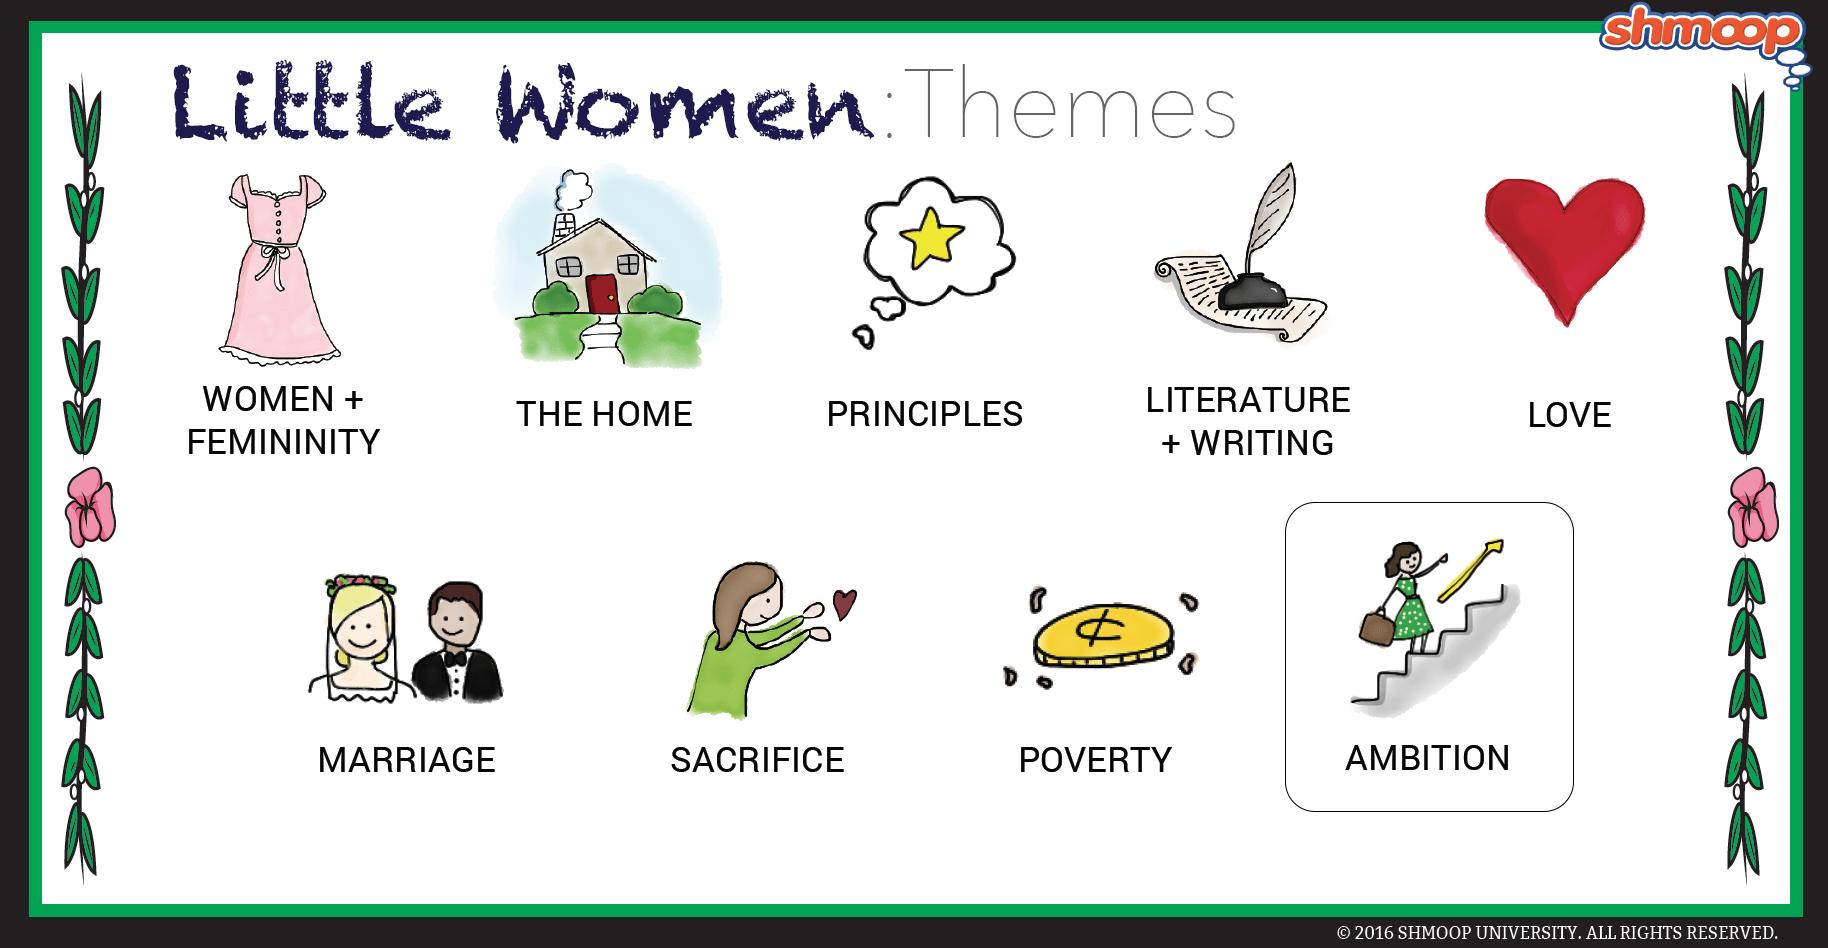 Little Women Theme Of Ambition